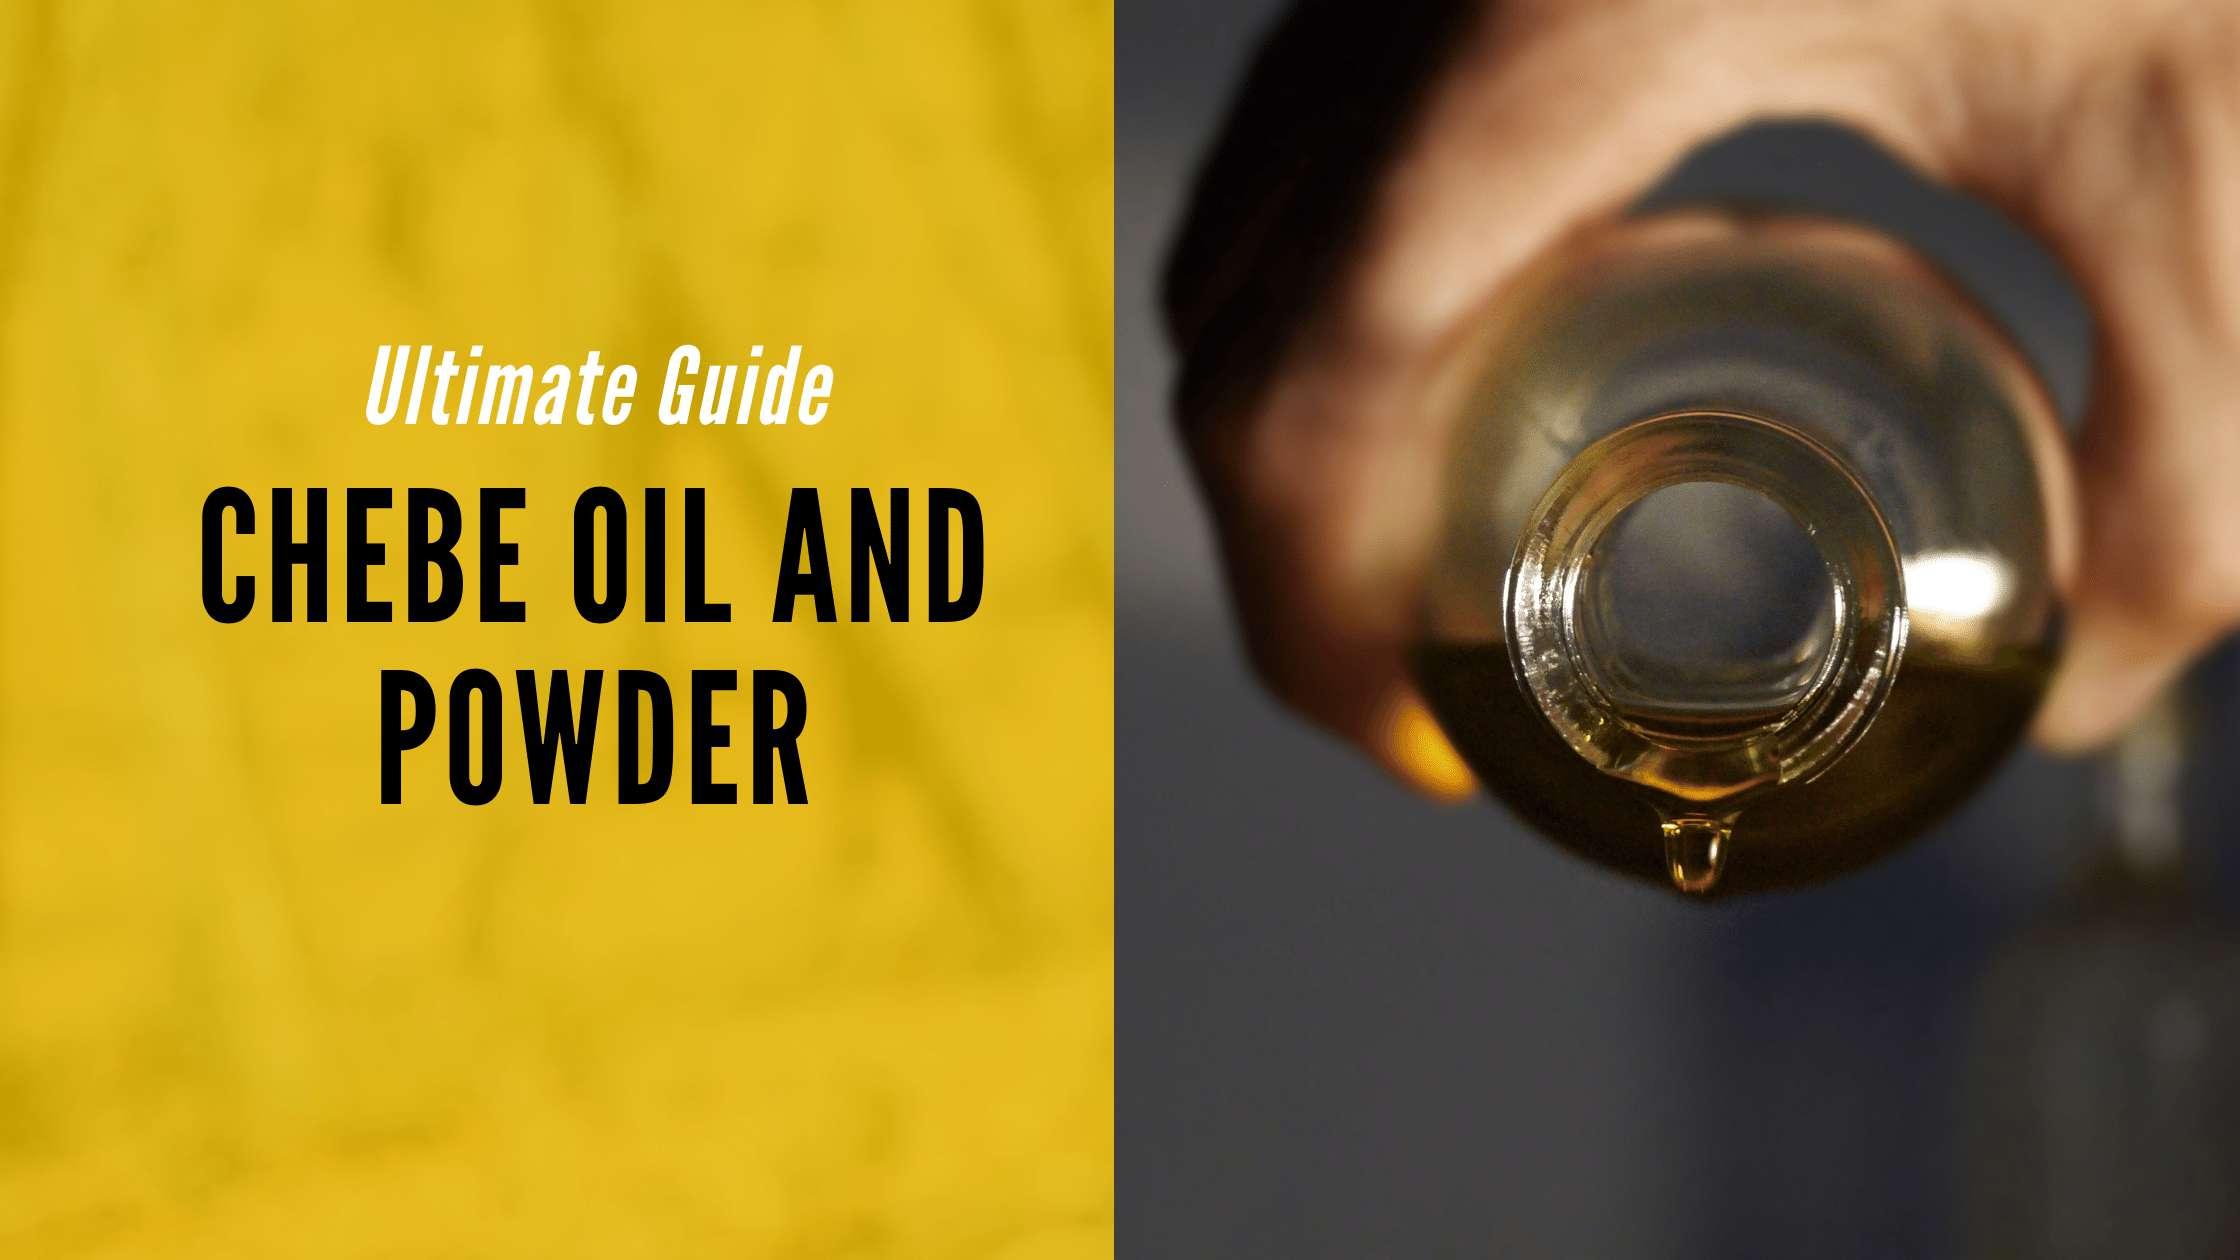 chebe oil